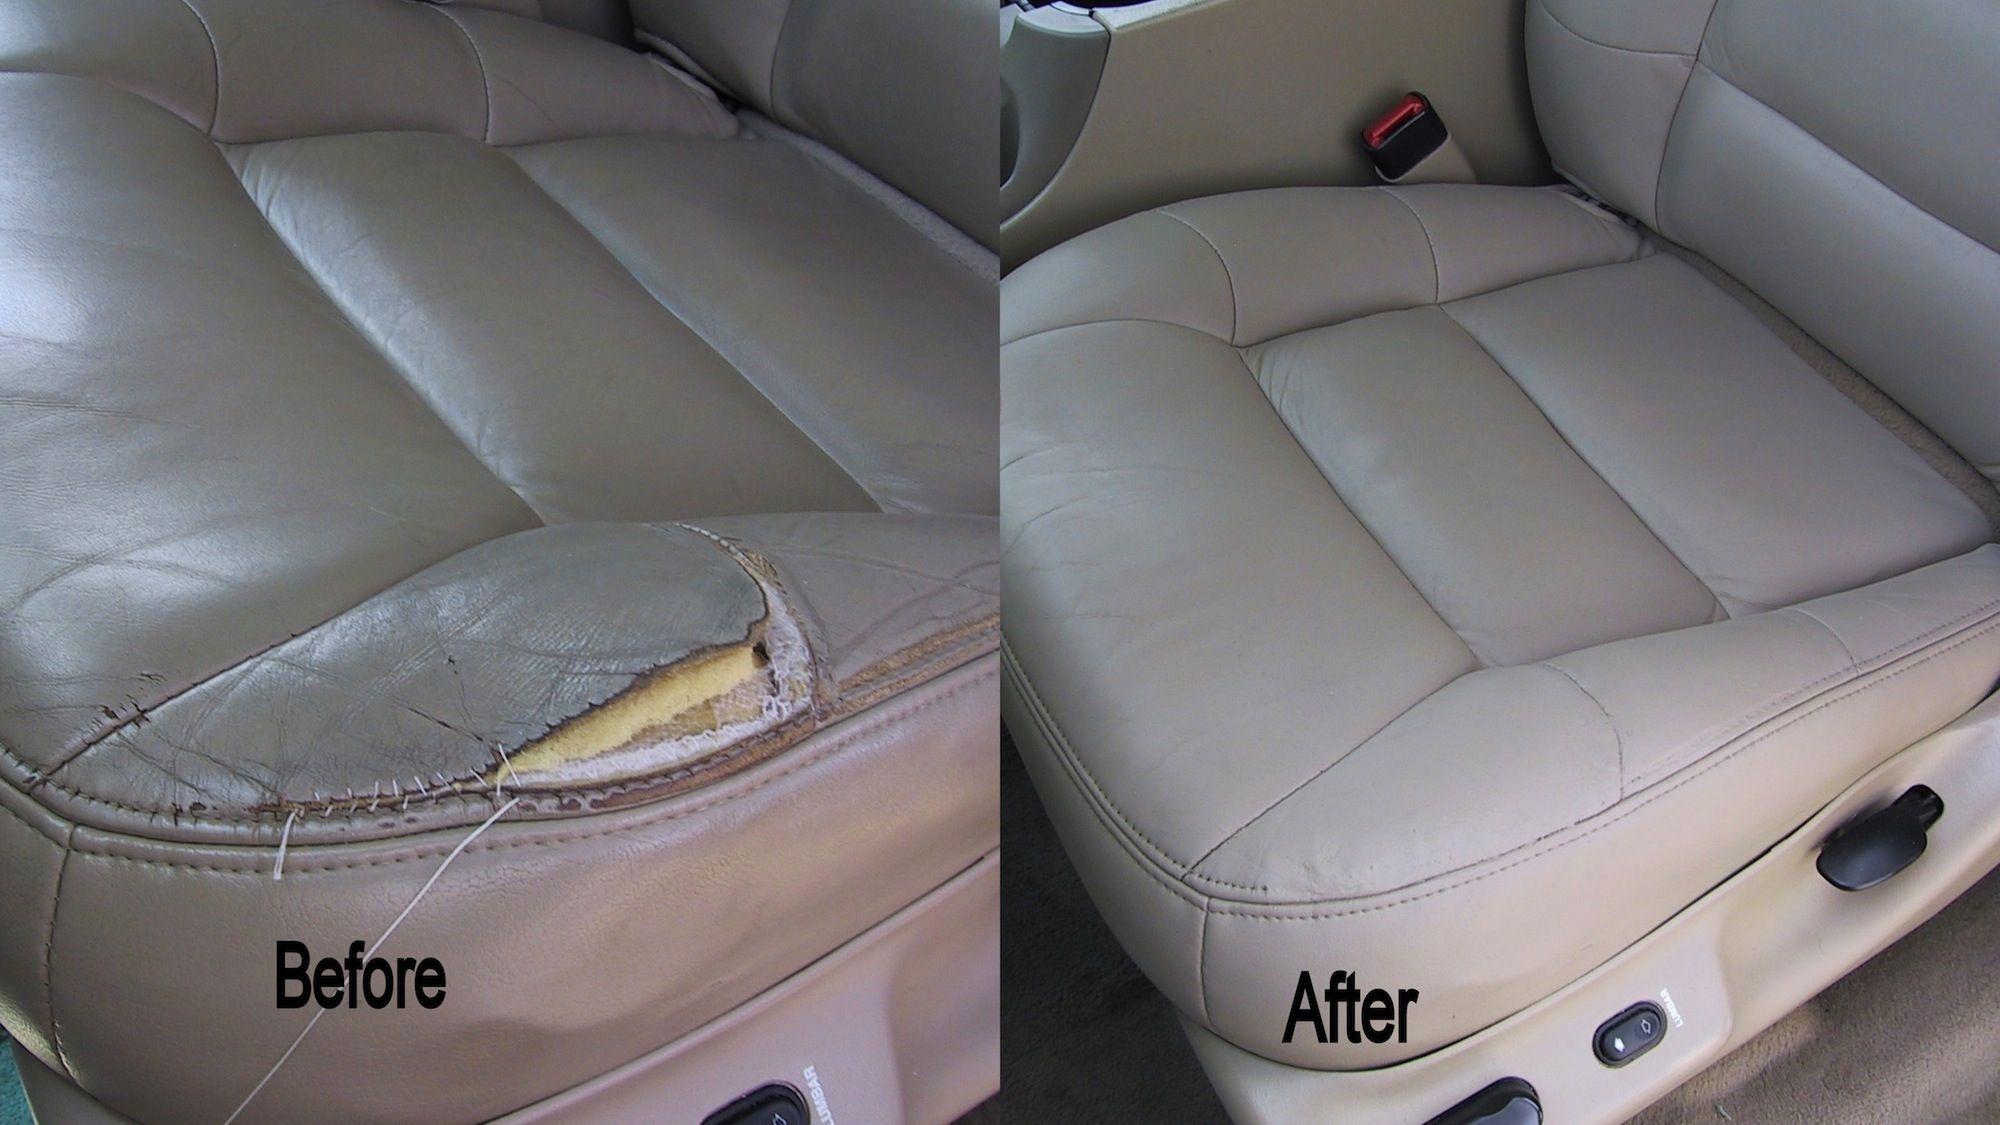 Patch Kit Leather repair, Leather furniture repair